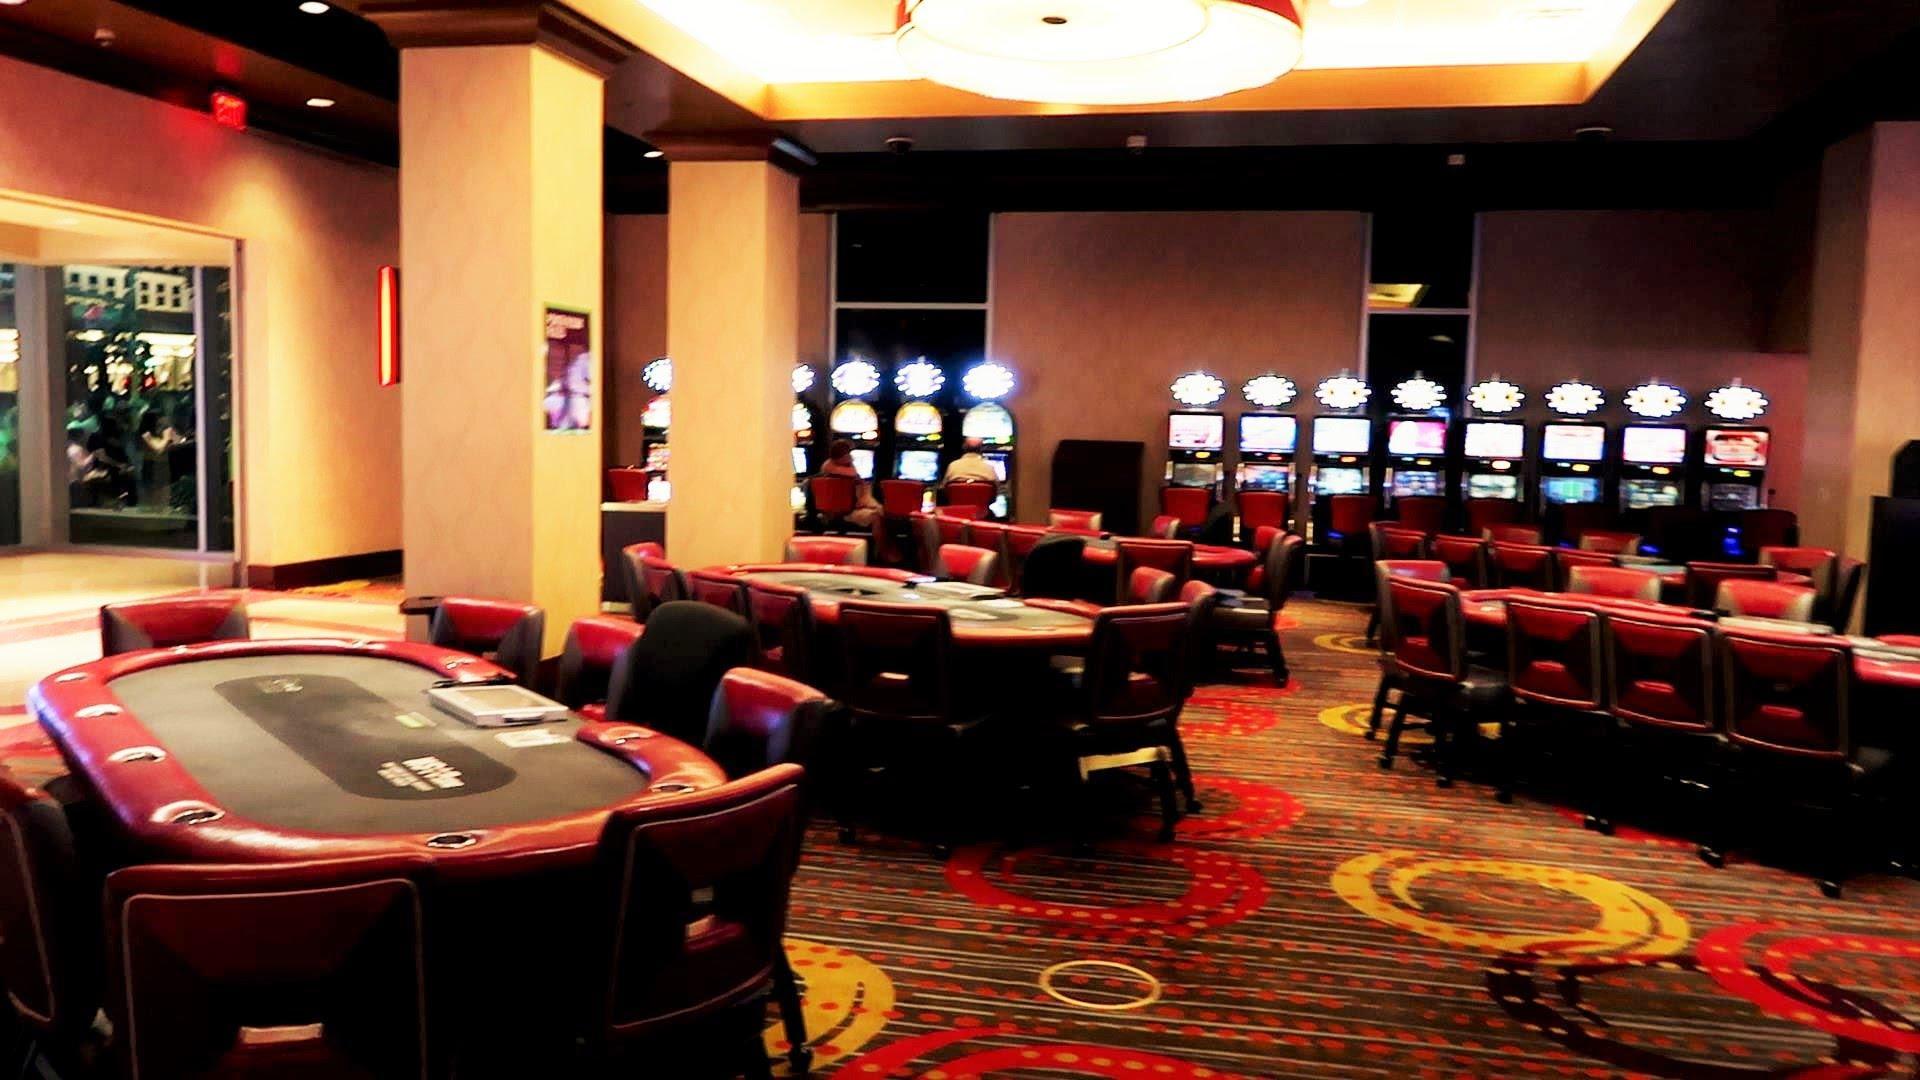 Las vegas casino hotels poker rooms gambling losses and income tax